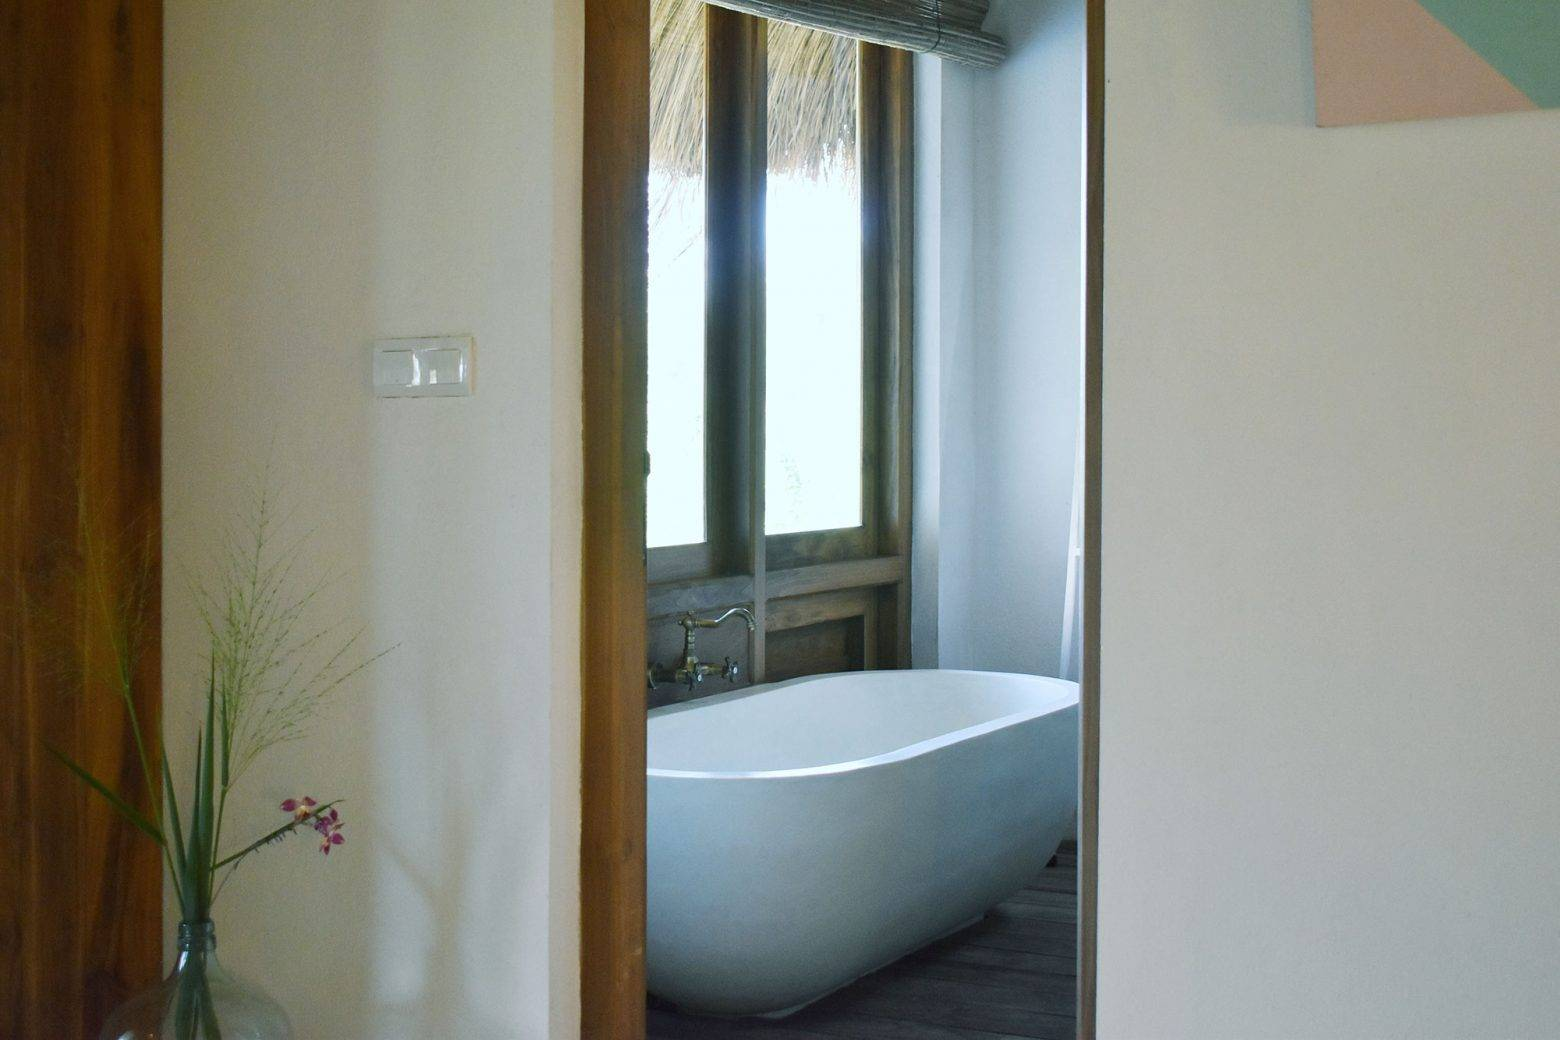 https://www.soulandsurf.com/wp-content/uploads/2021/07/Tekanda-RoomsCopy-of-Tek-Bath-Glimpse-e1627747184470.jpg